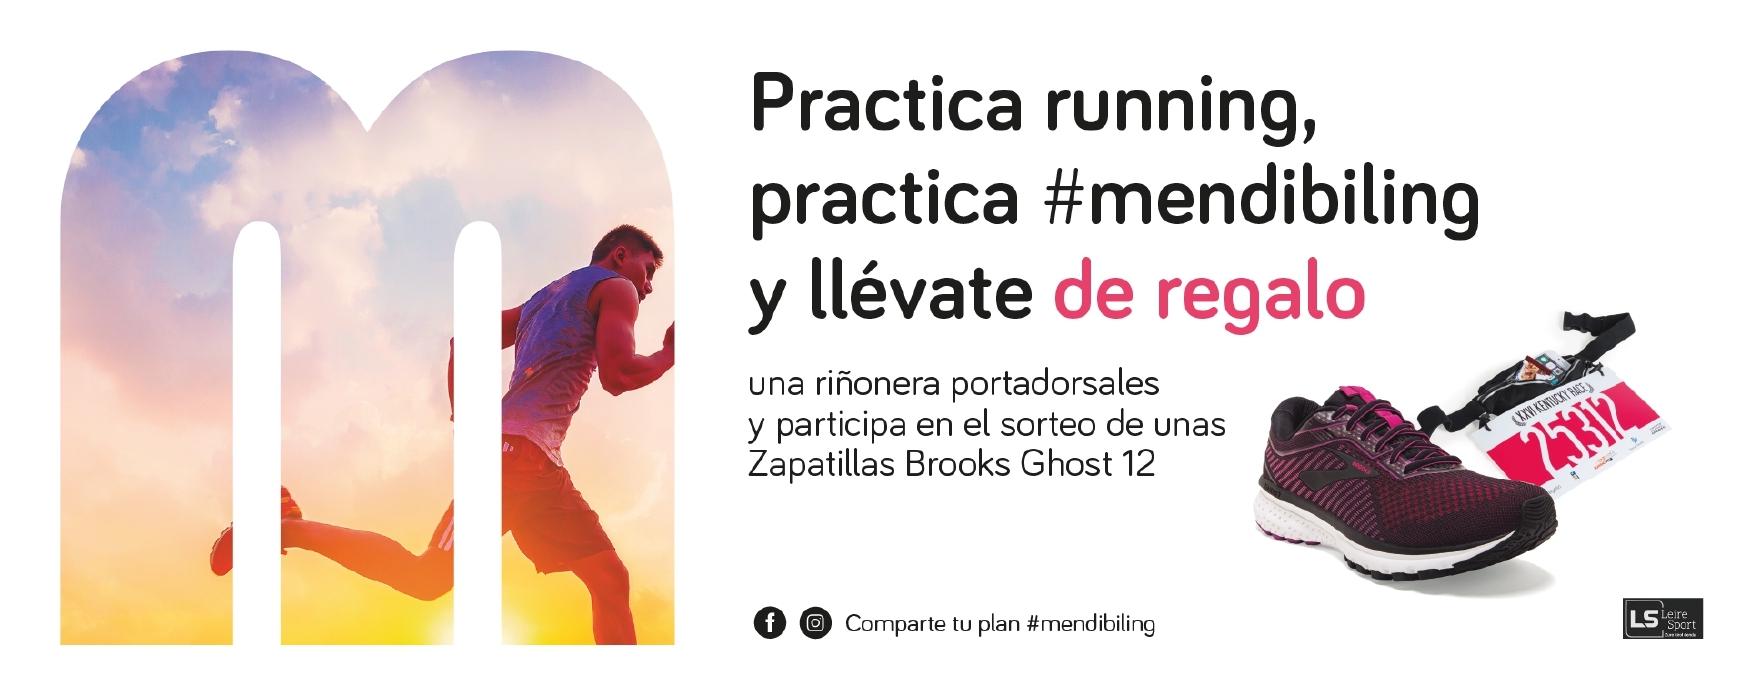 Practica running, practica #mendibiling